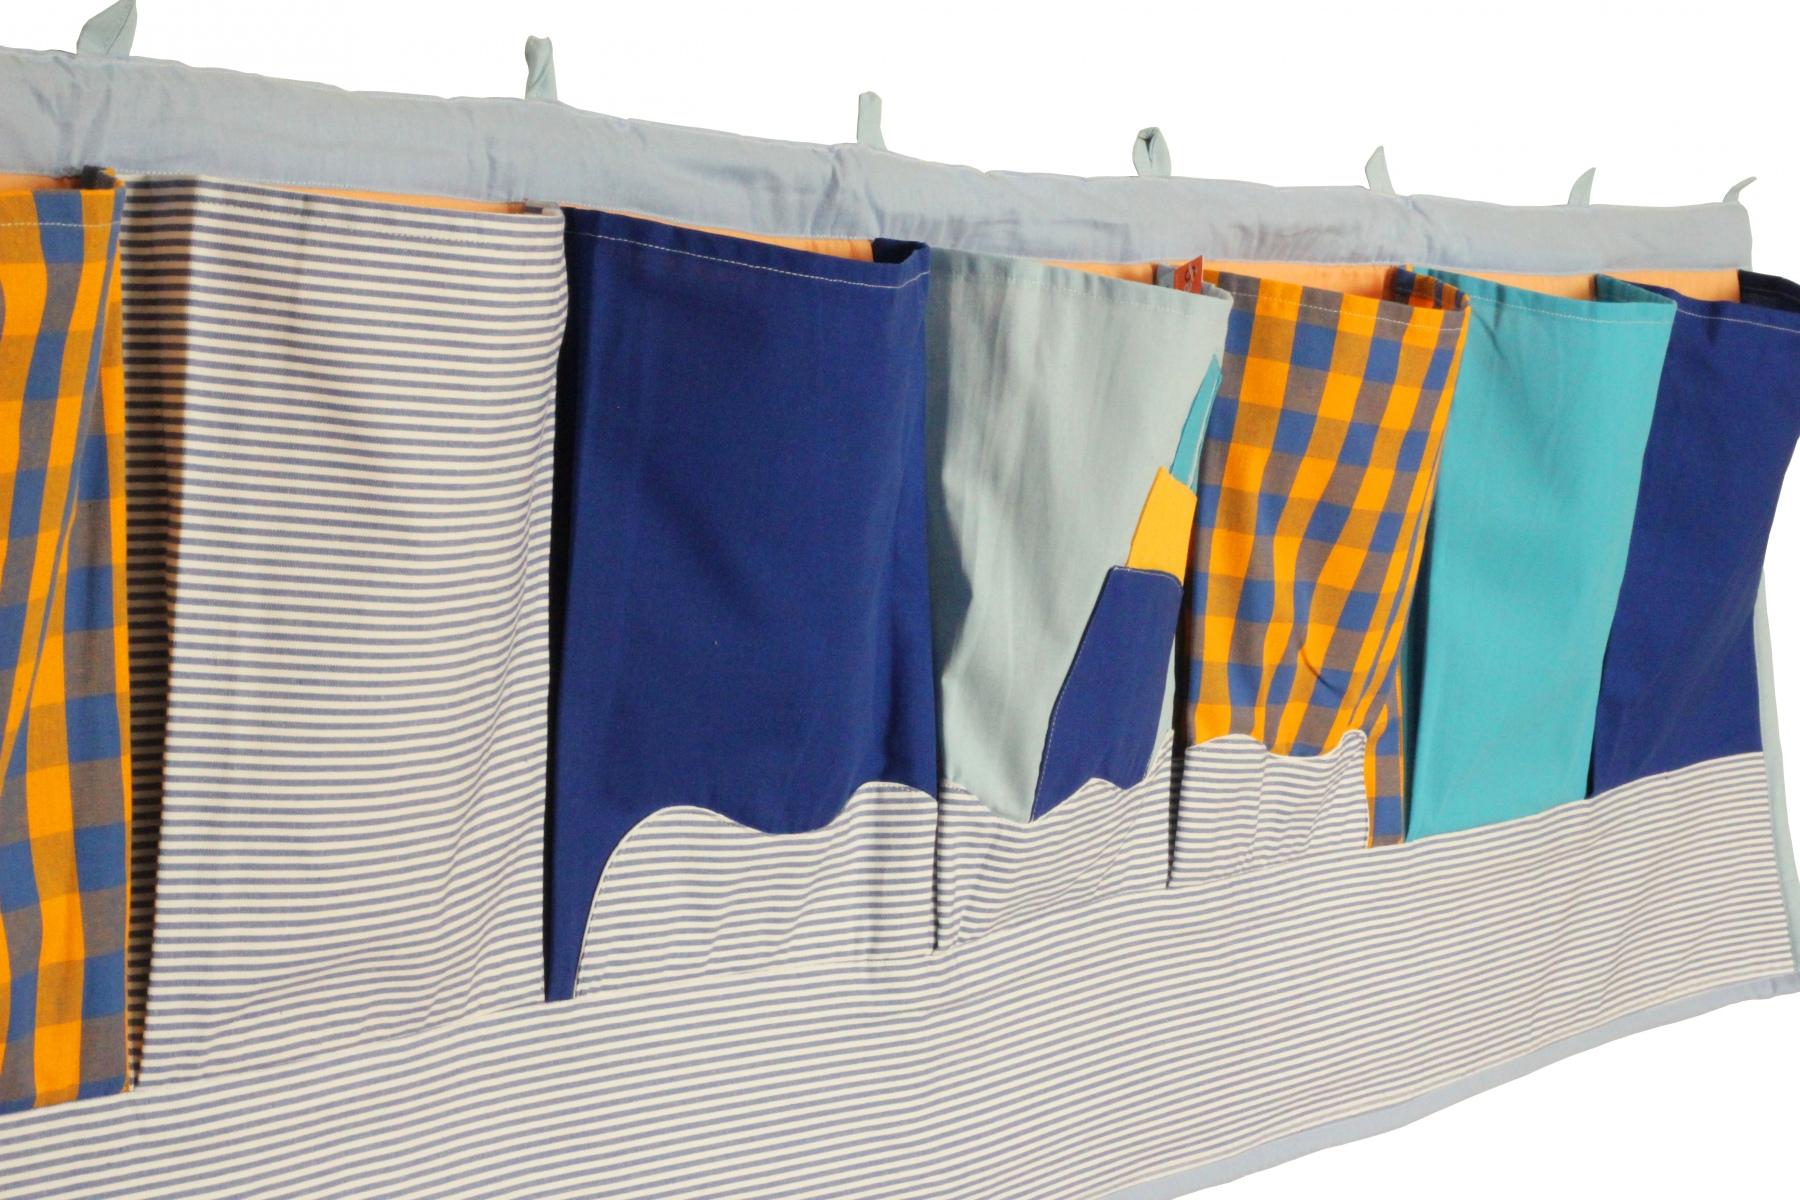 rangement mural poches en coton en mer. Black Bedroom Furniture Sets. Home Design Ideas